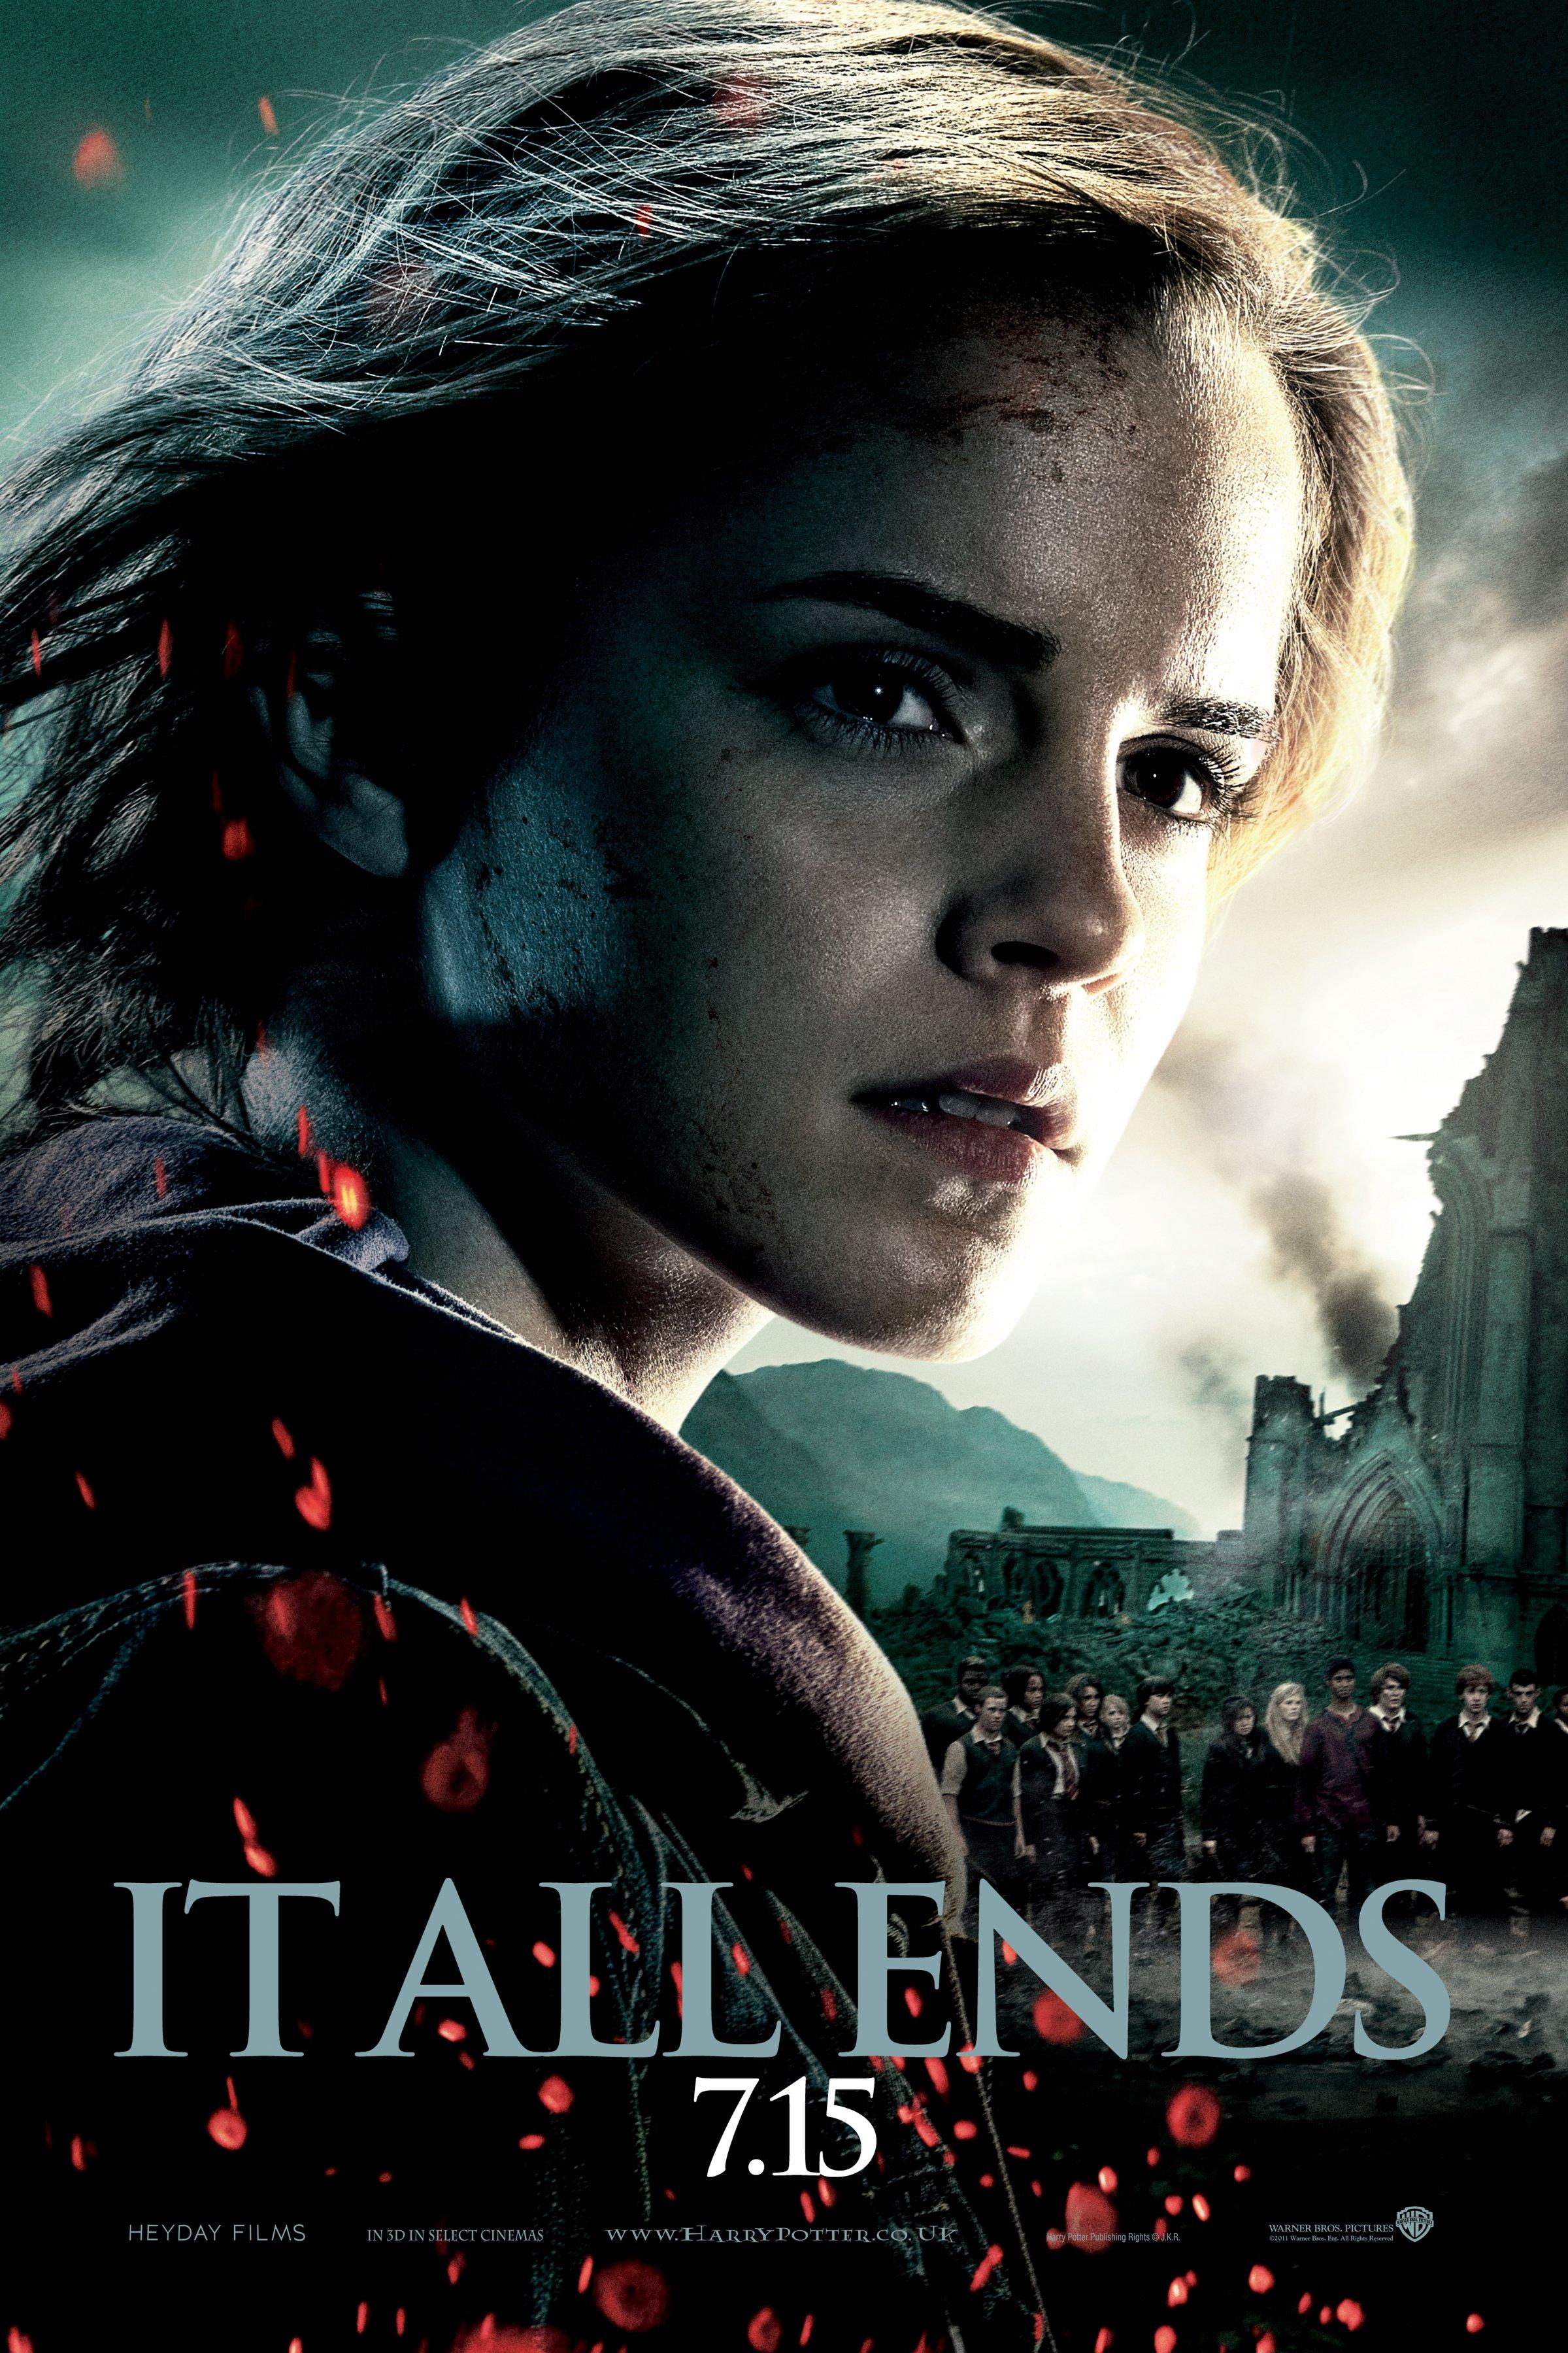 Bestand:Hermione poster-DH2.jpg